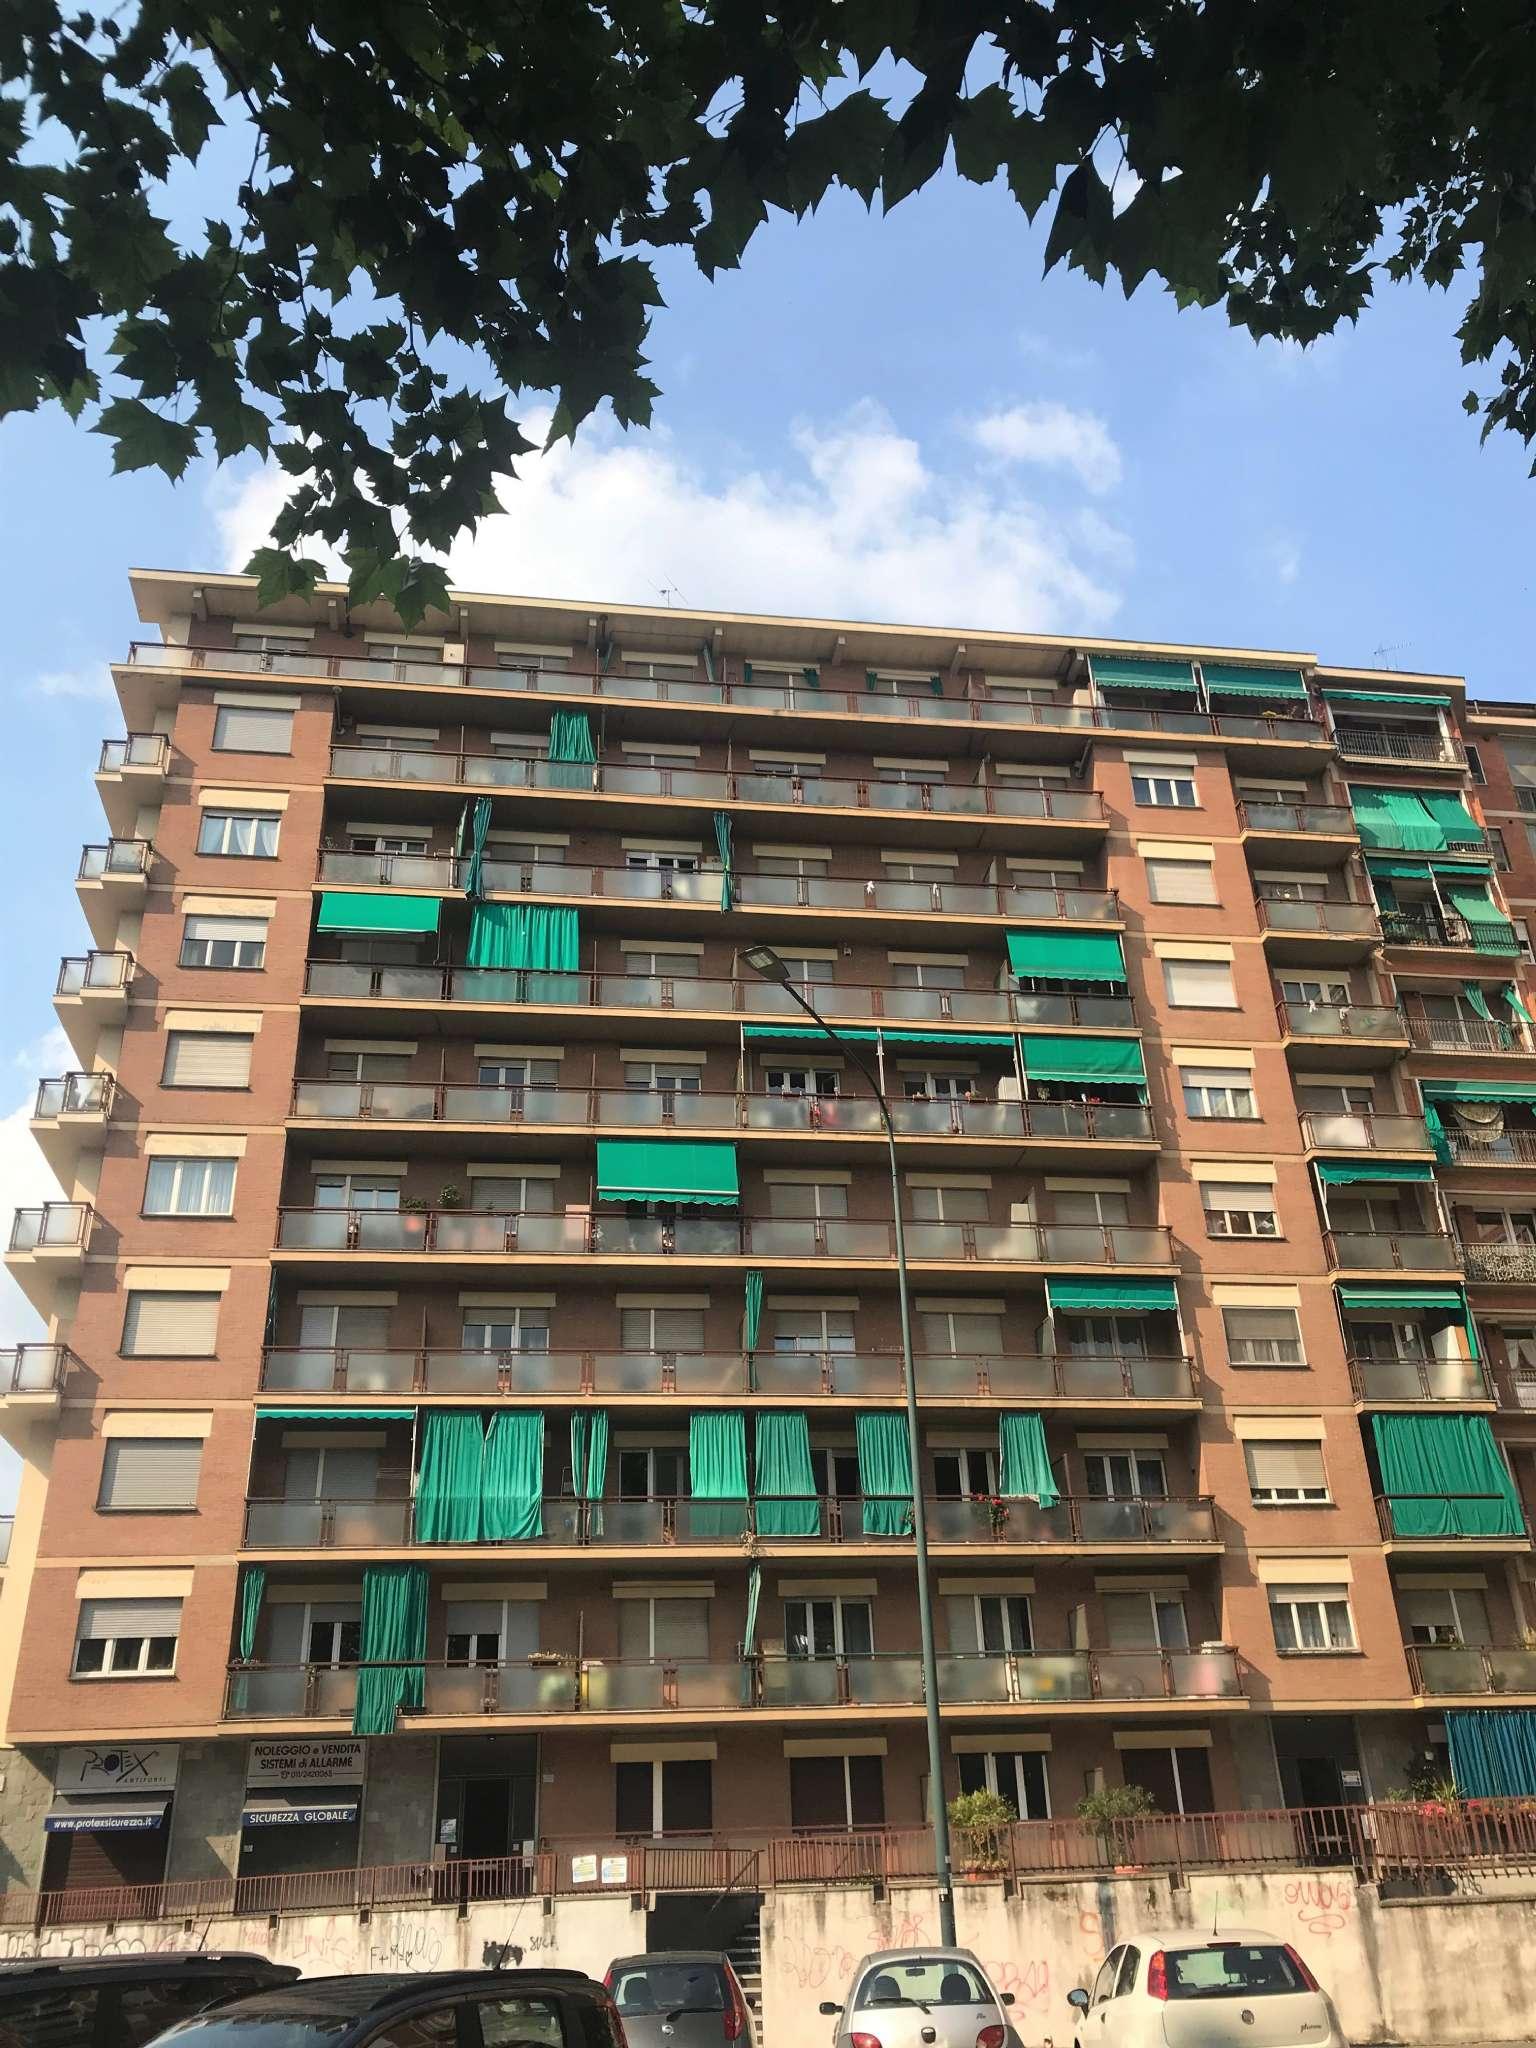 Appartamento in affitto Zona Barriera Milano, Falchera, Barca-Be... - via VIA GOTTARDO 37 Torino